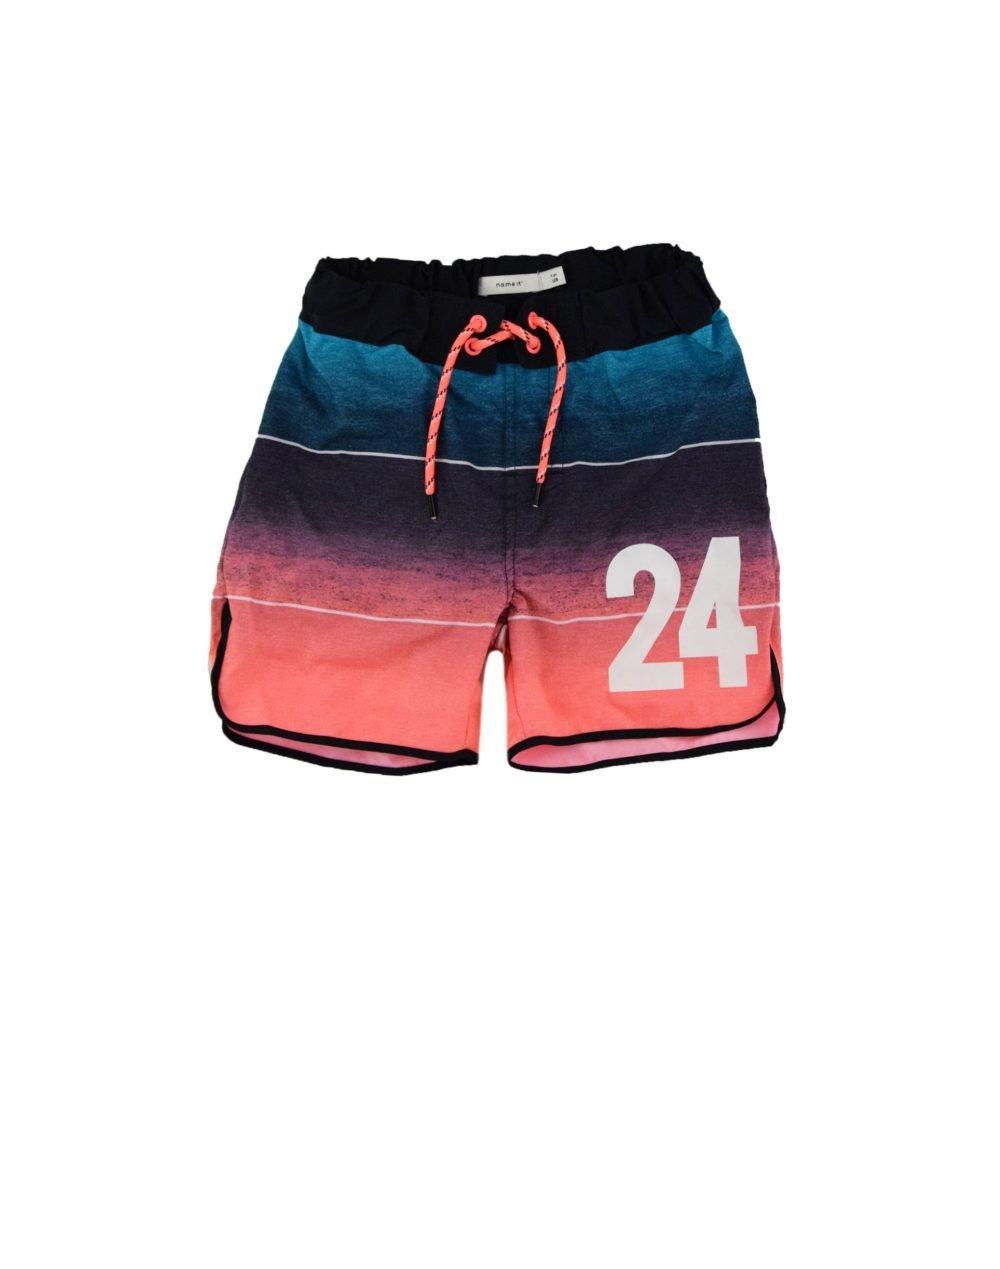 Name It Zaids Long Shorts (13175169) Neon Coral